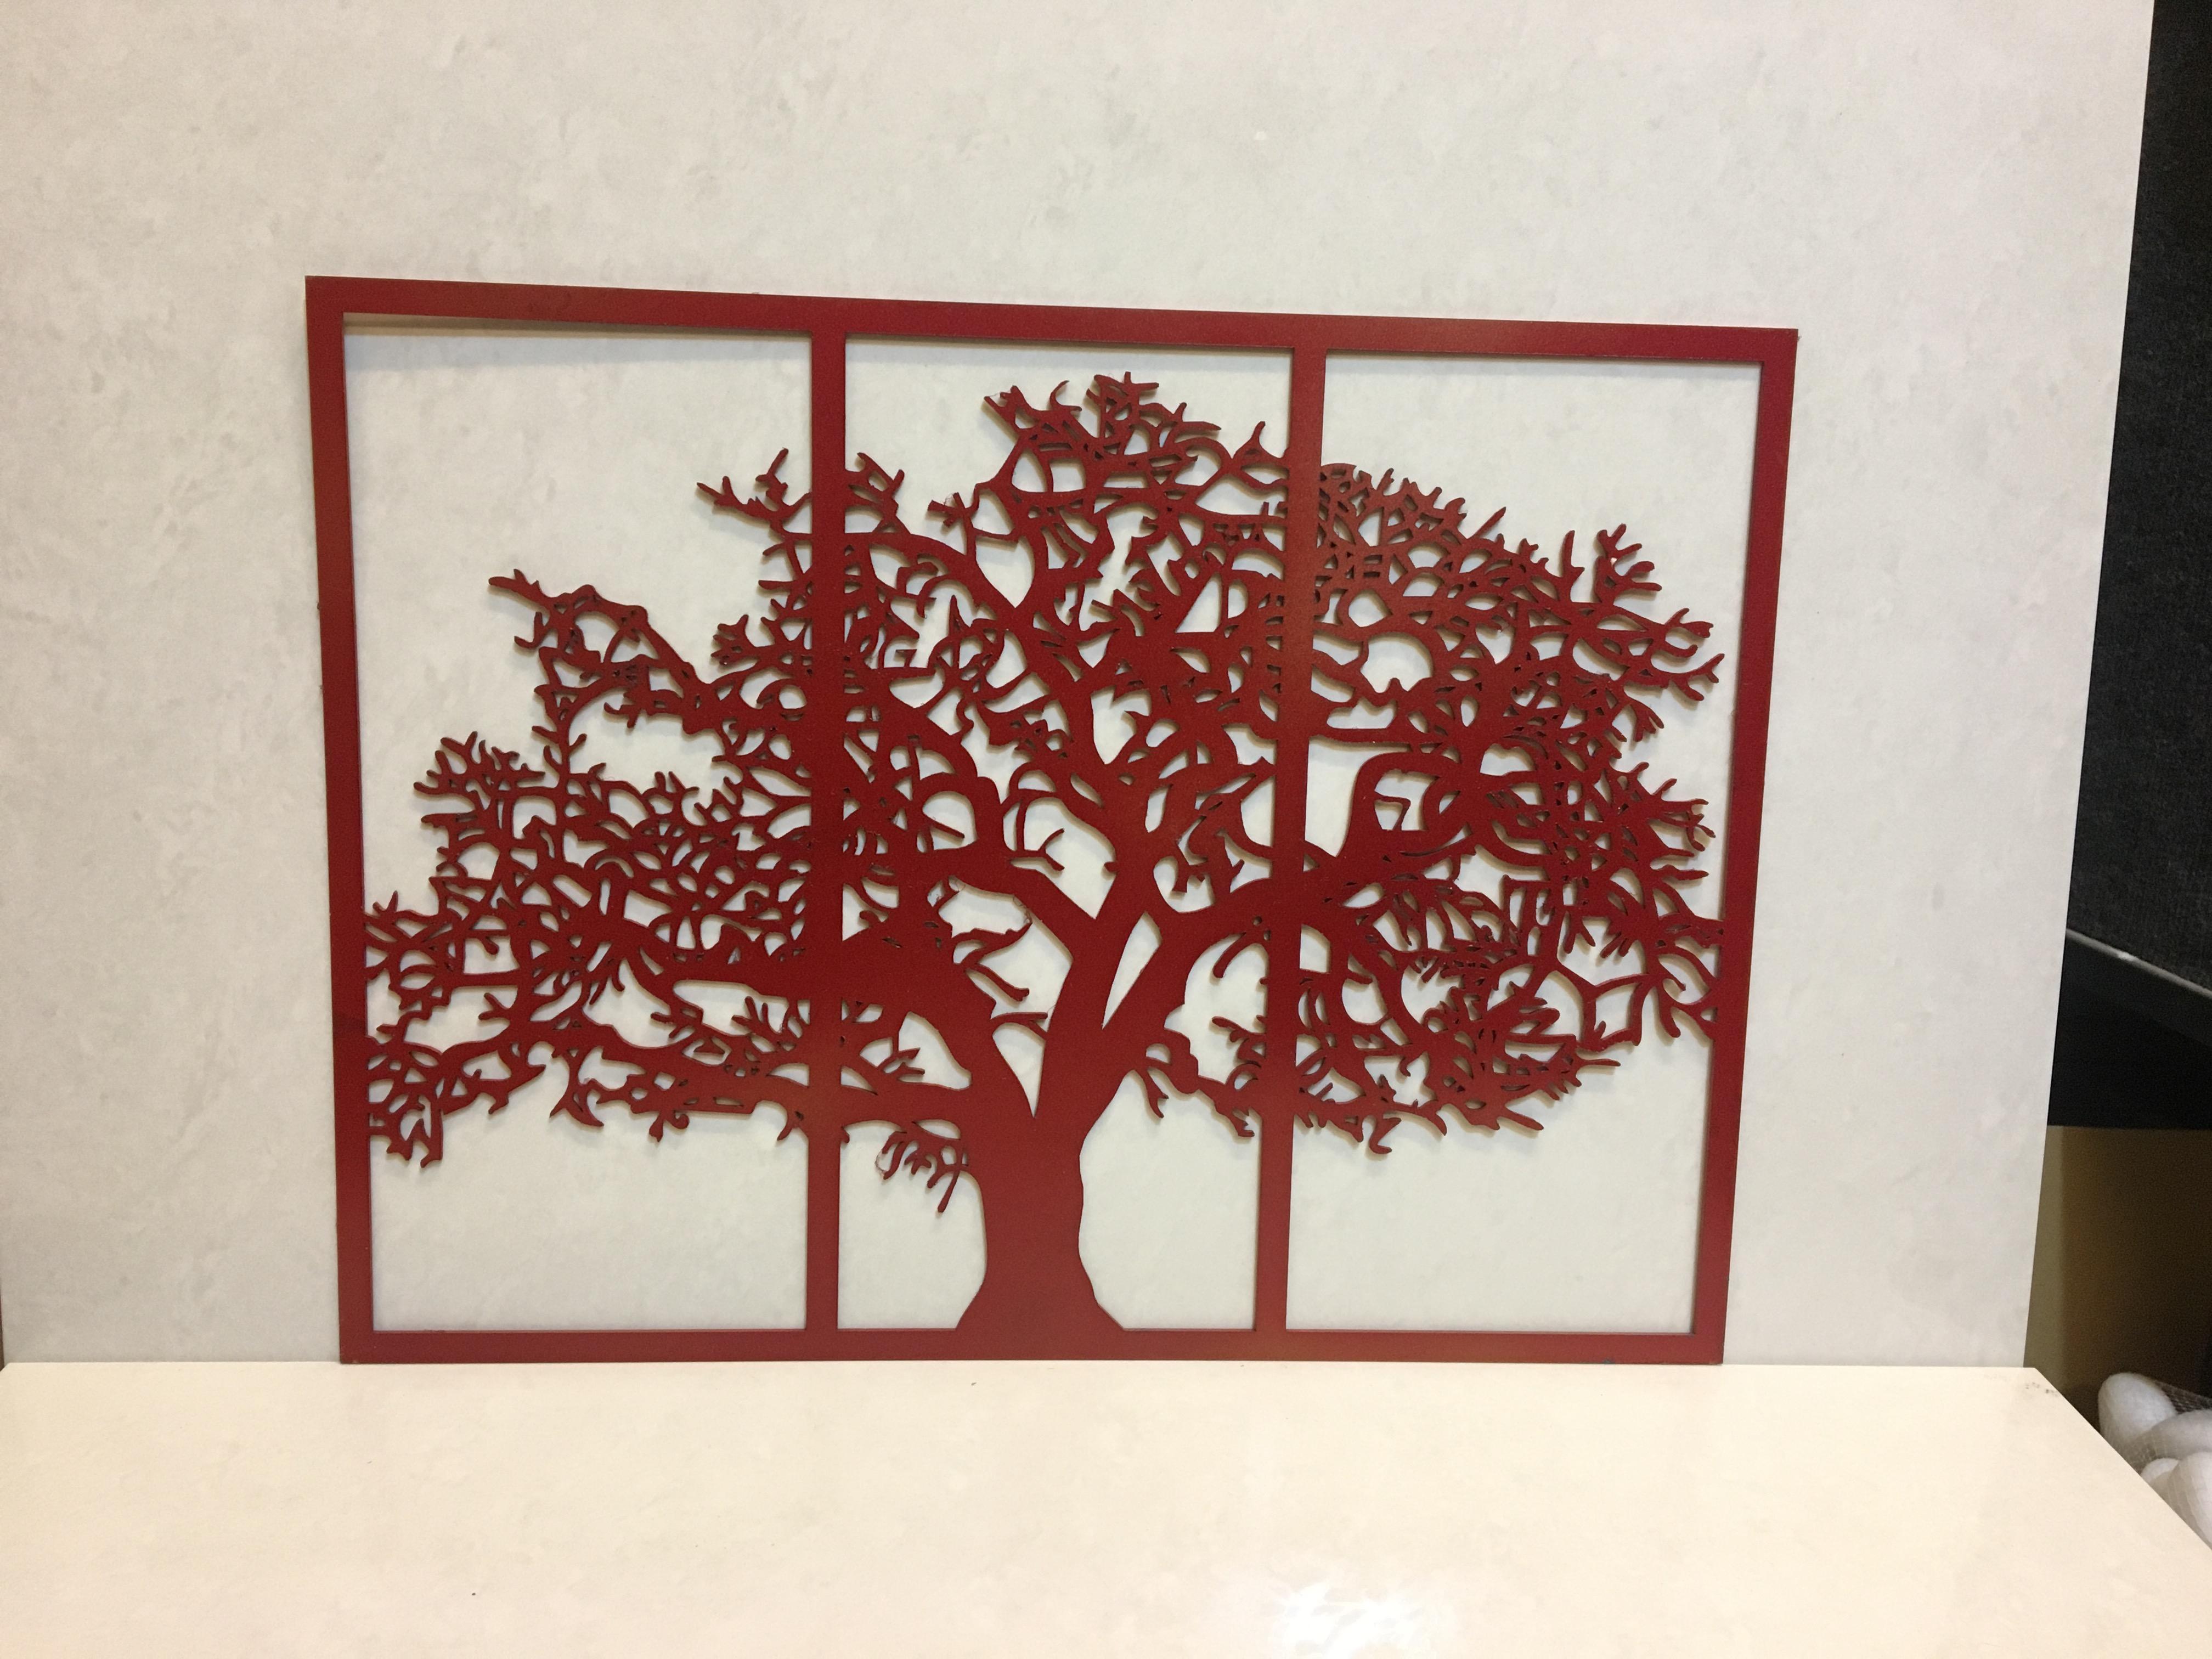 Metal Tree Of Life Wall Decor Red – Houzdecor Intended For Tree Of Life Wall Decor (View 24 of 30)